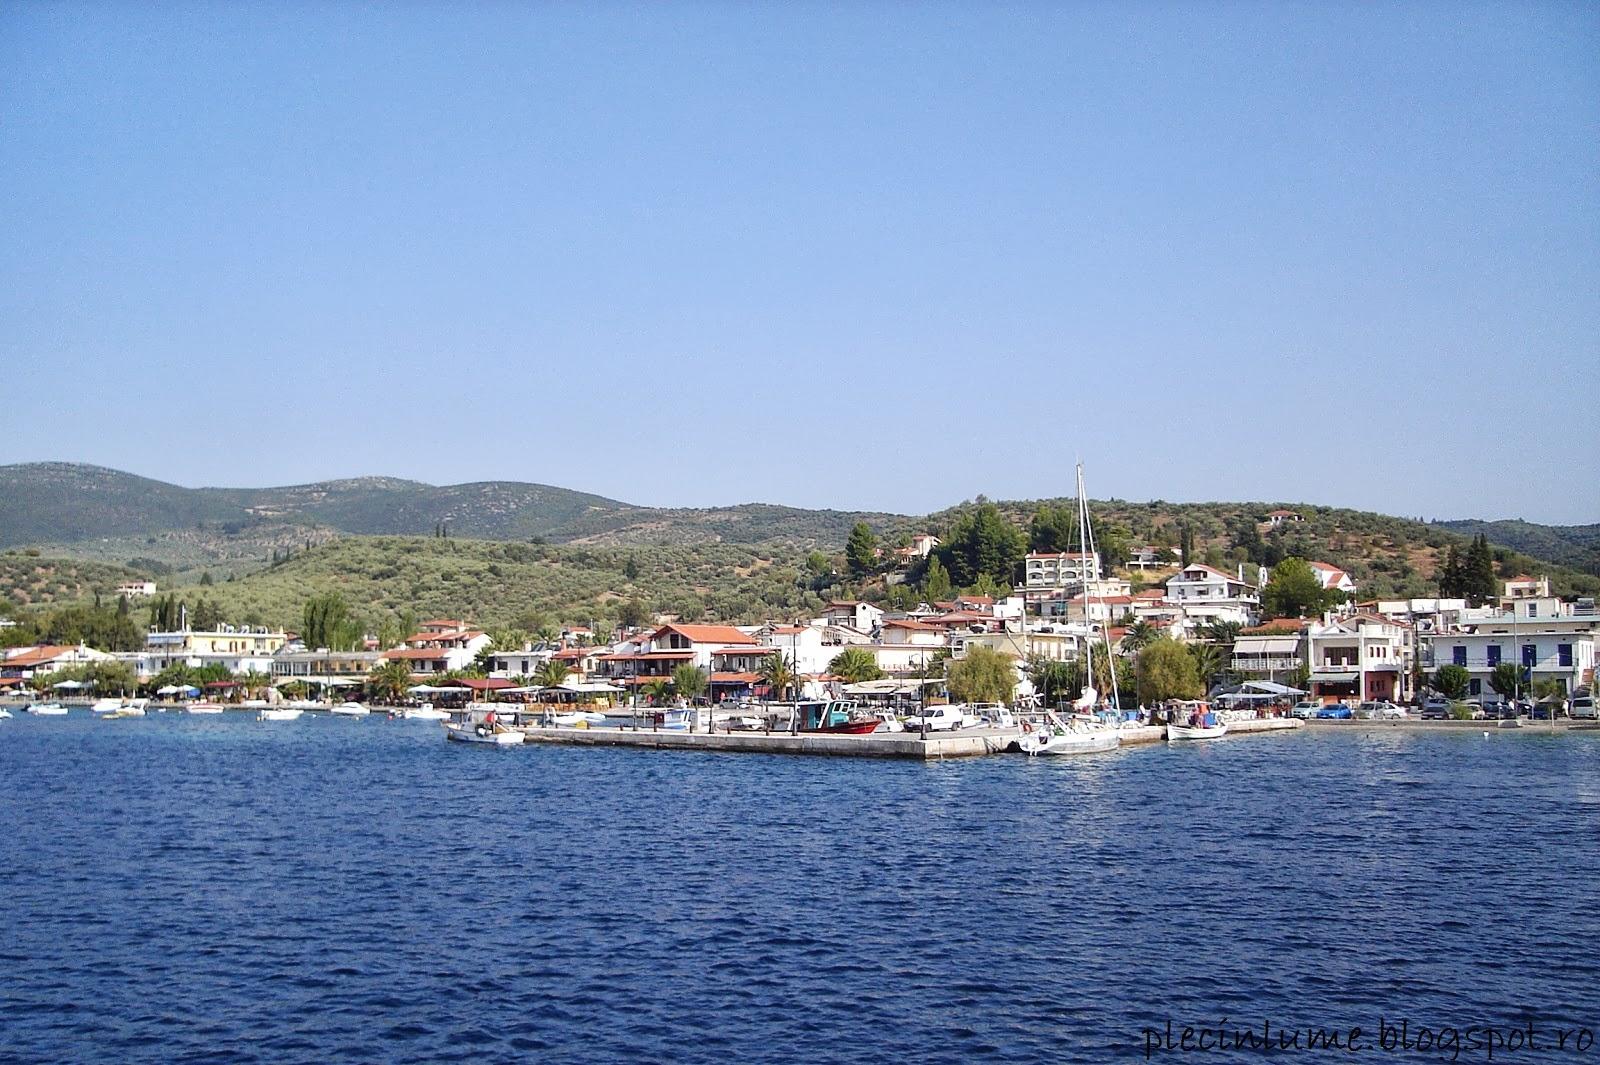 Plecare din port spre Skiathos